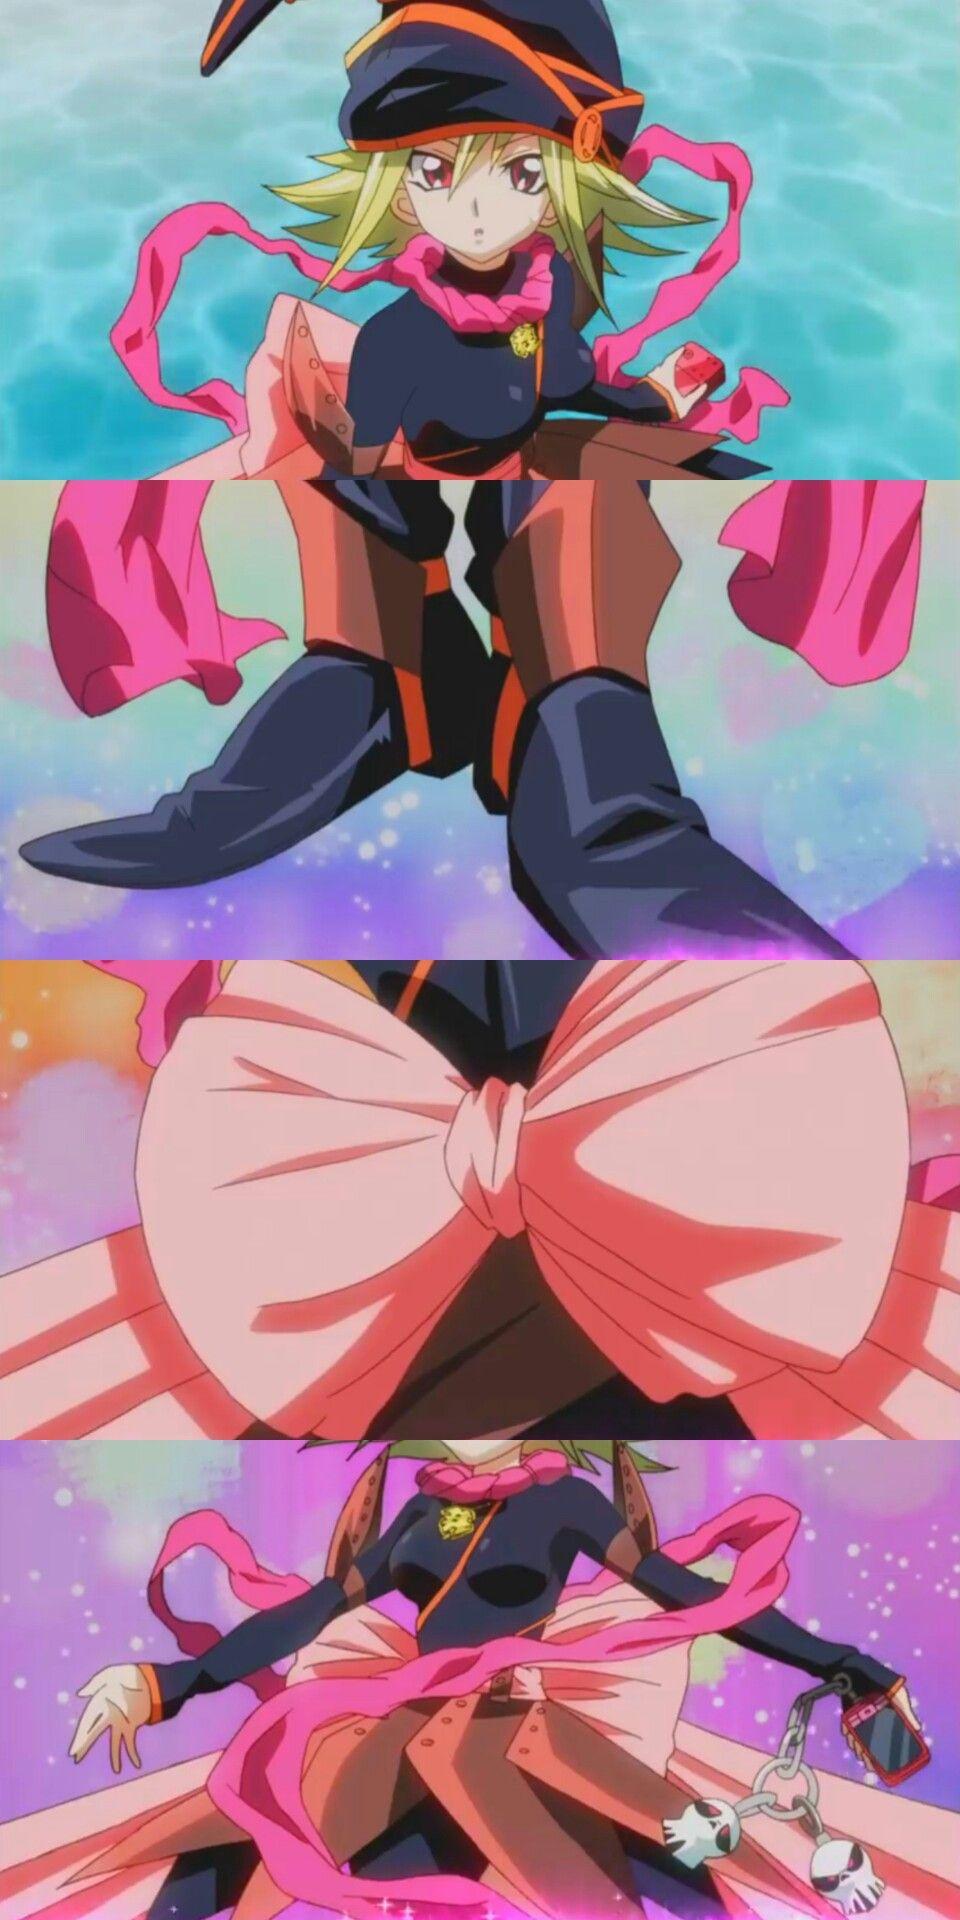 Yugioh Manga Zexal - Anime Girl Pfp